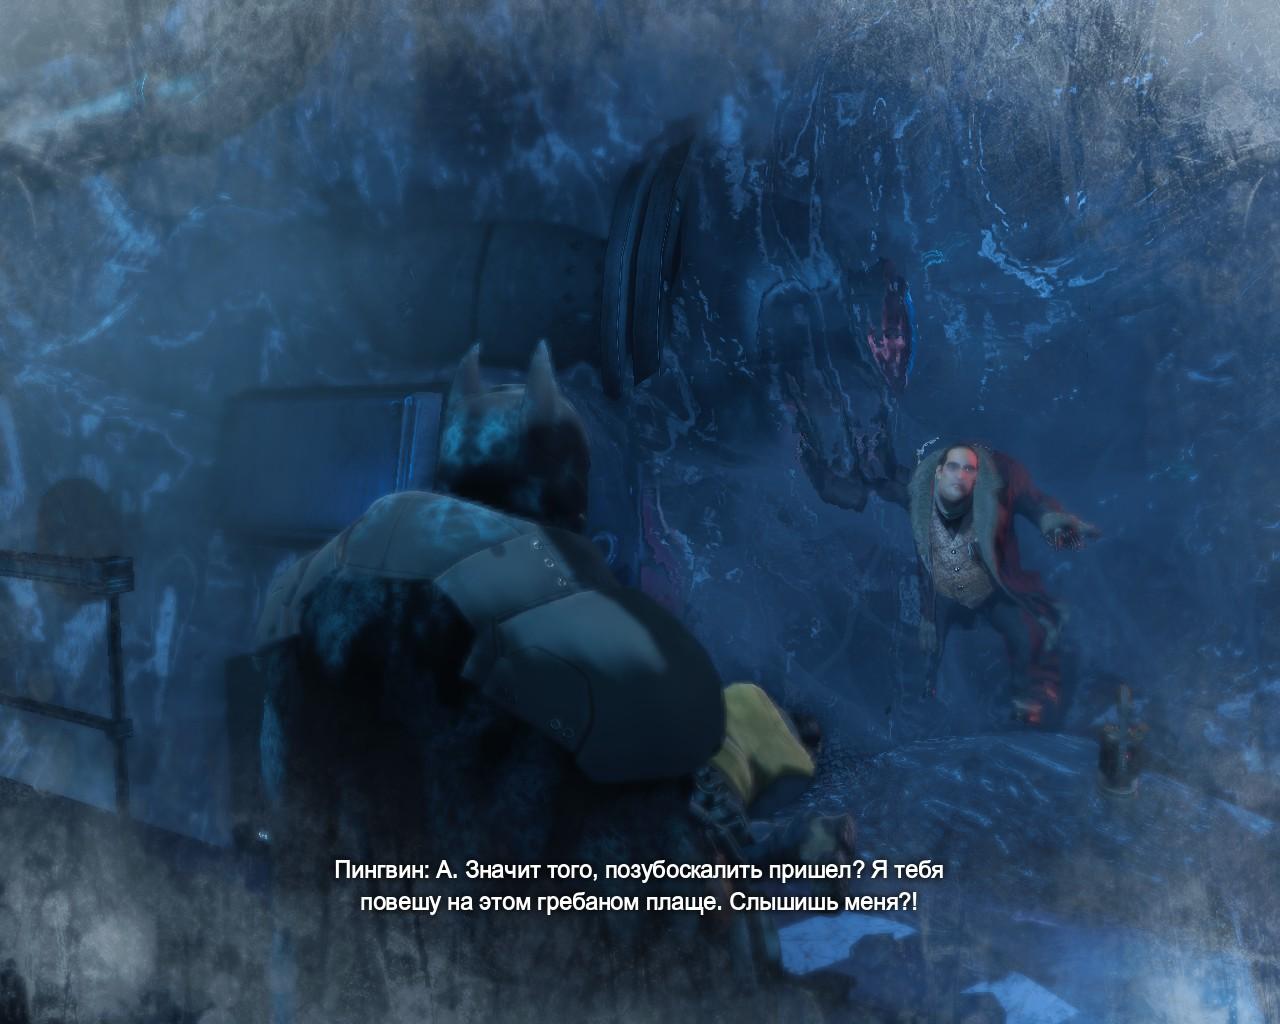 BatmanOrigins 2014-07-13 02-13-13-65.jpg - Batman: Arkham Origins